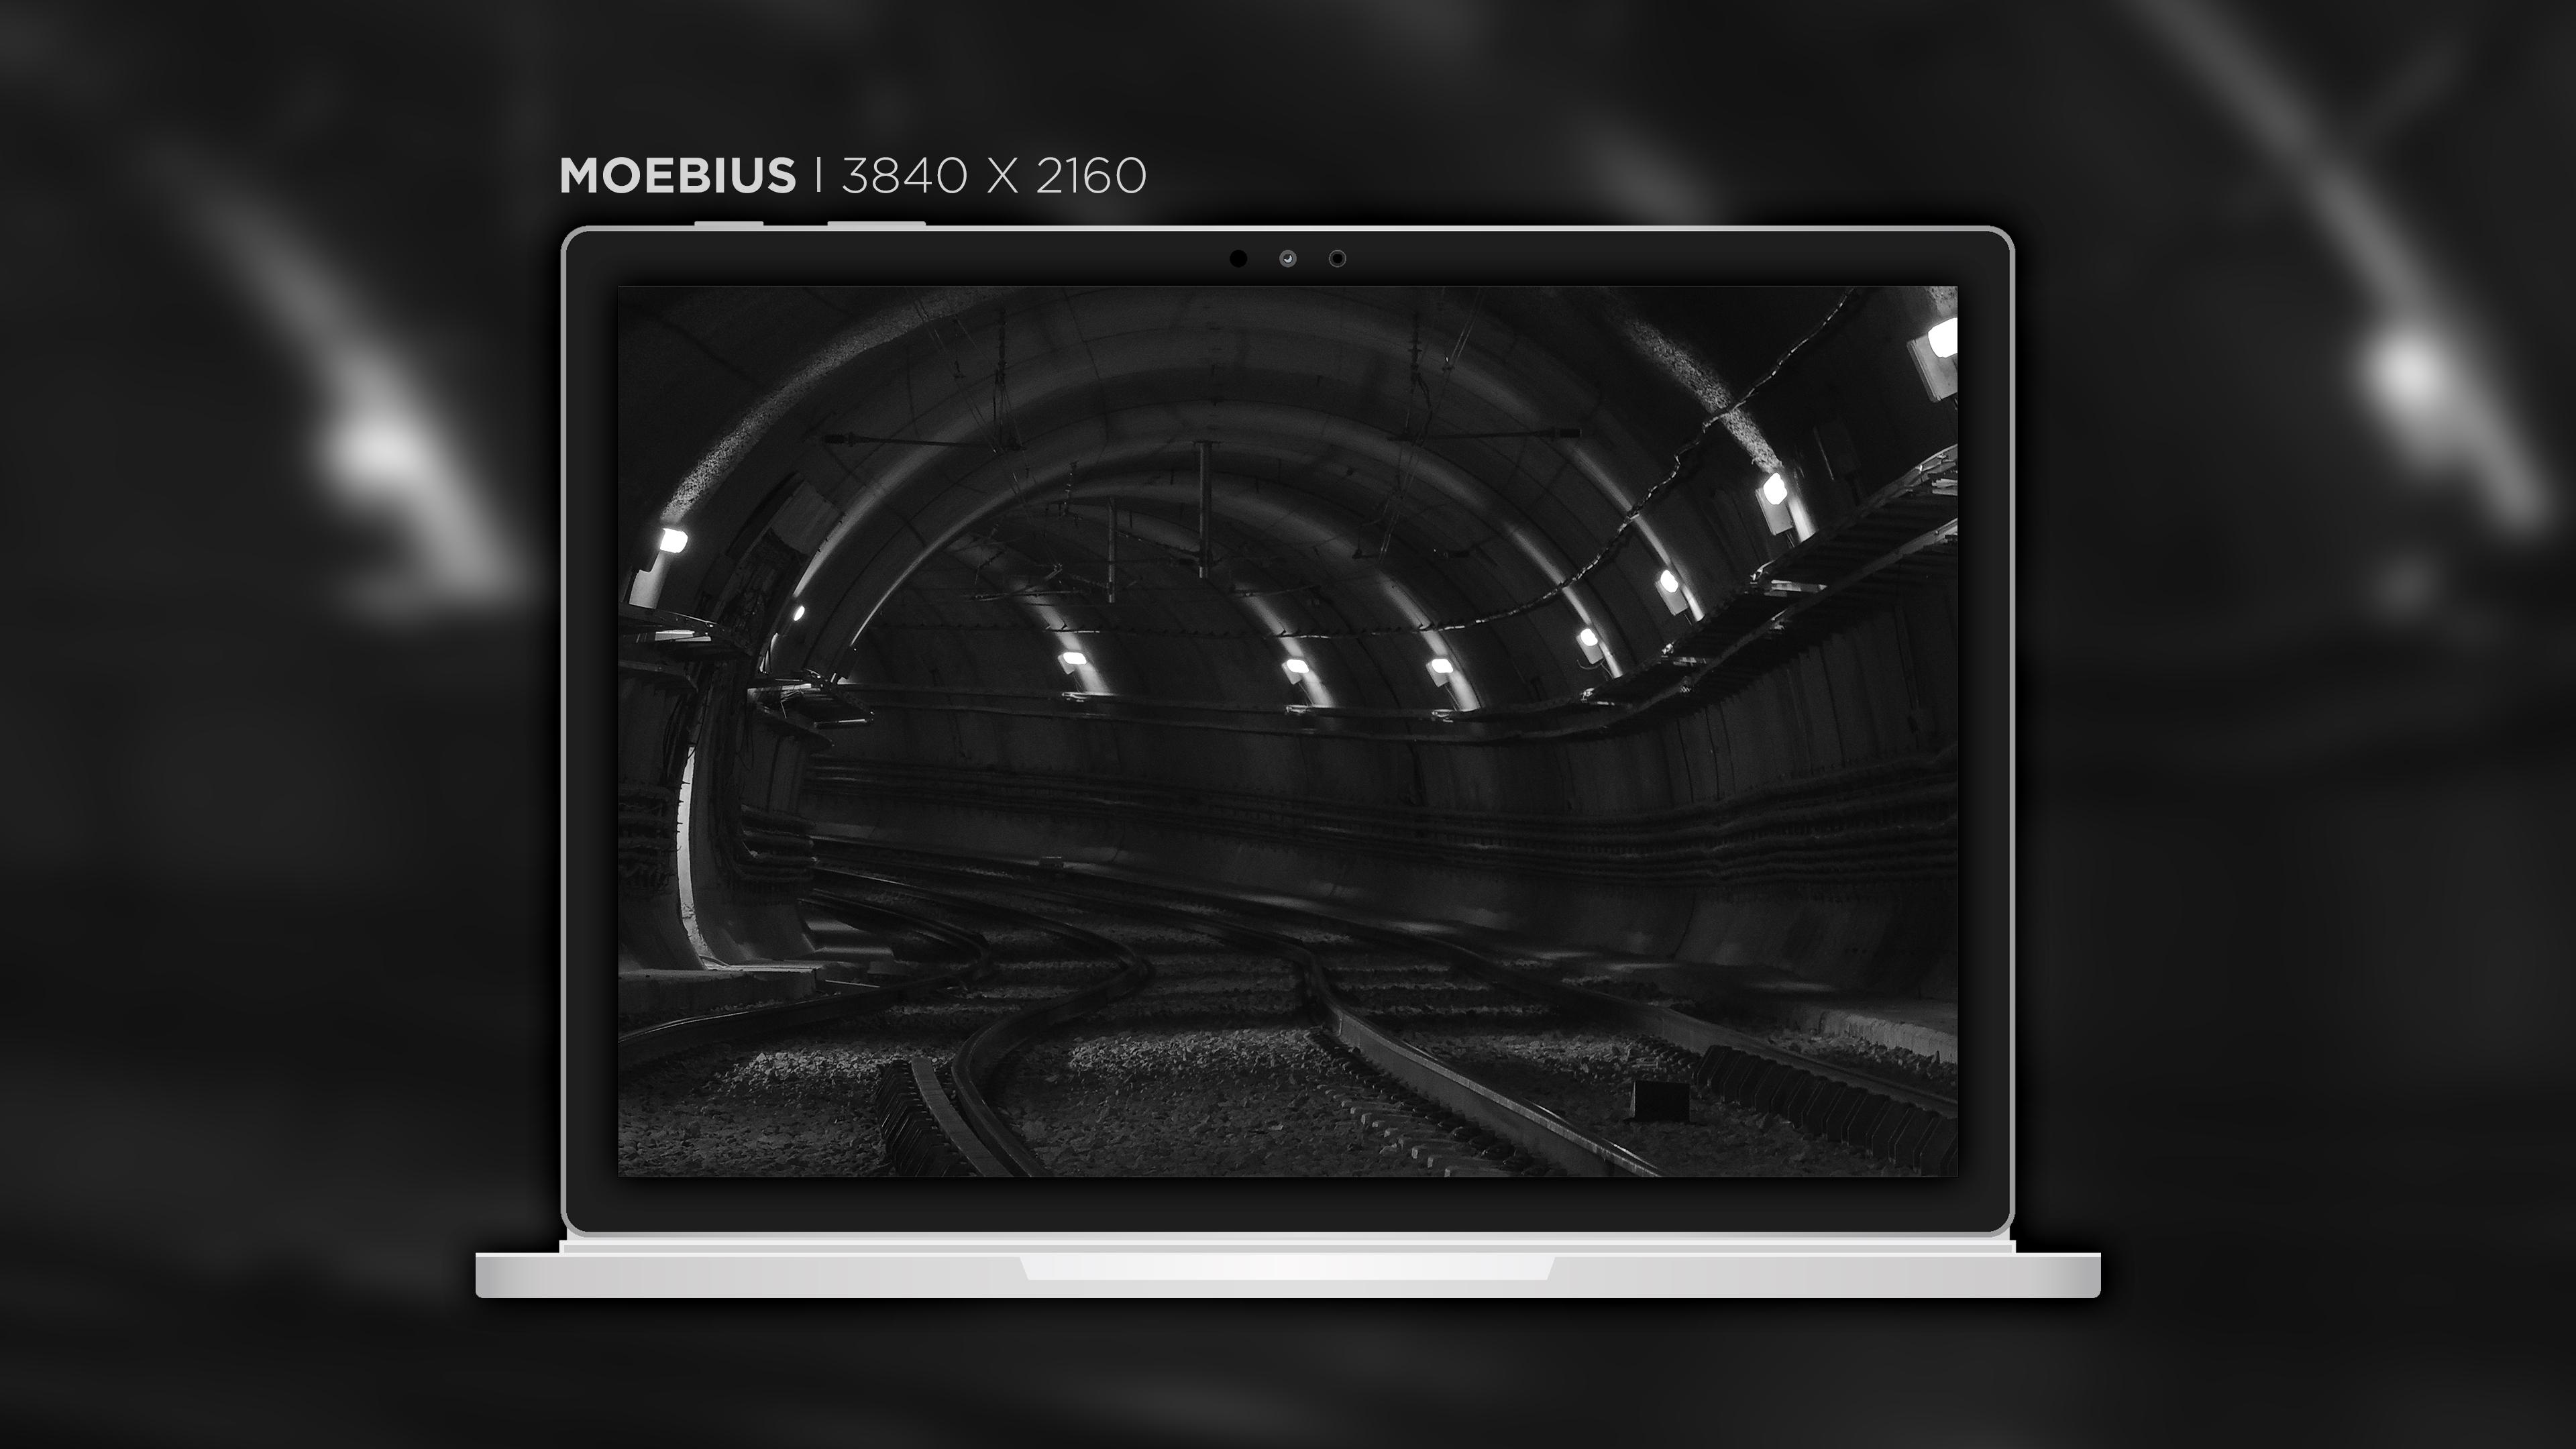 Moebius - 4K Wallpaper by MauroTch